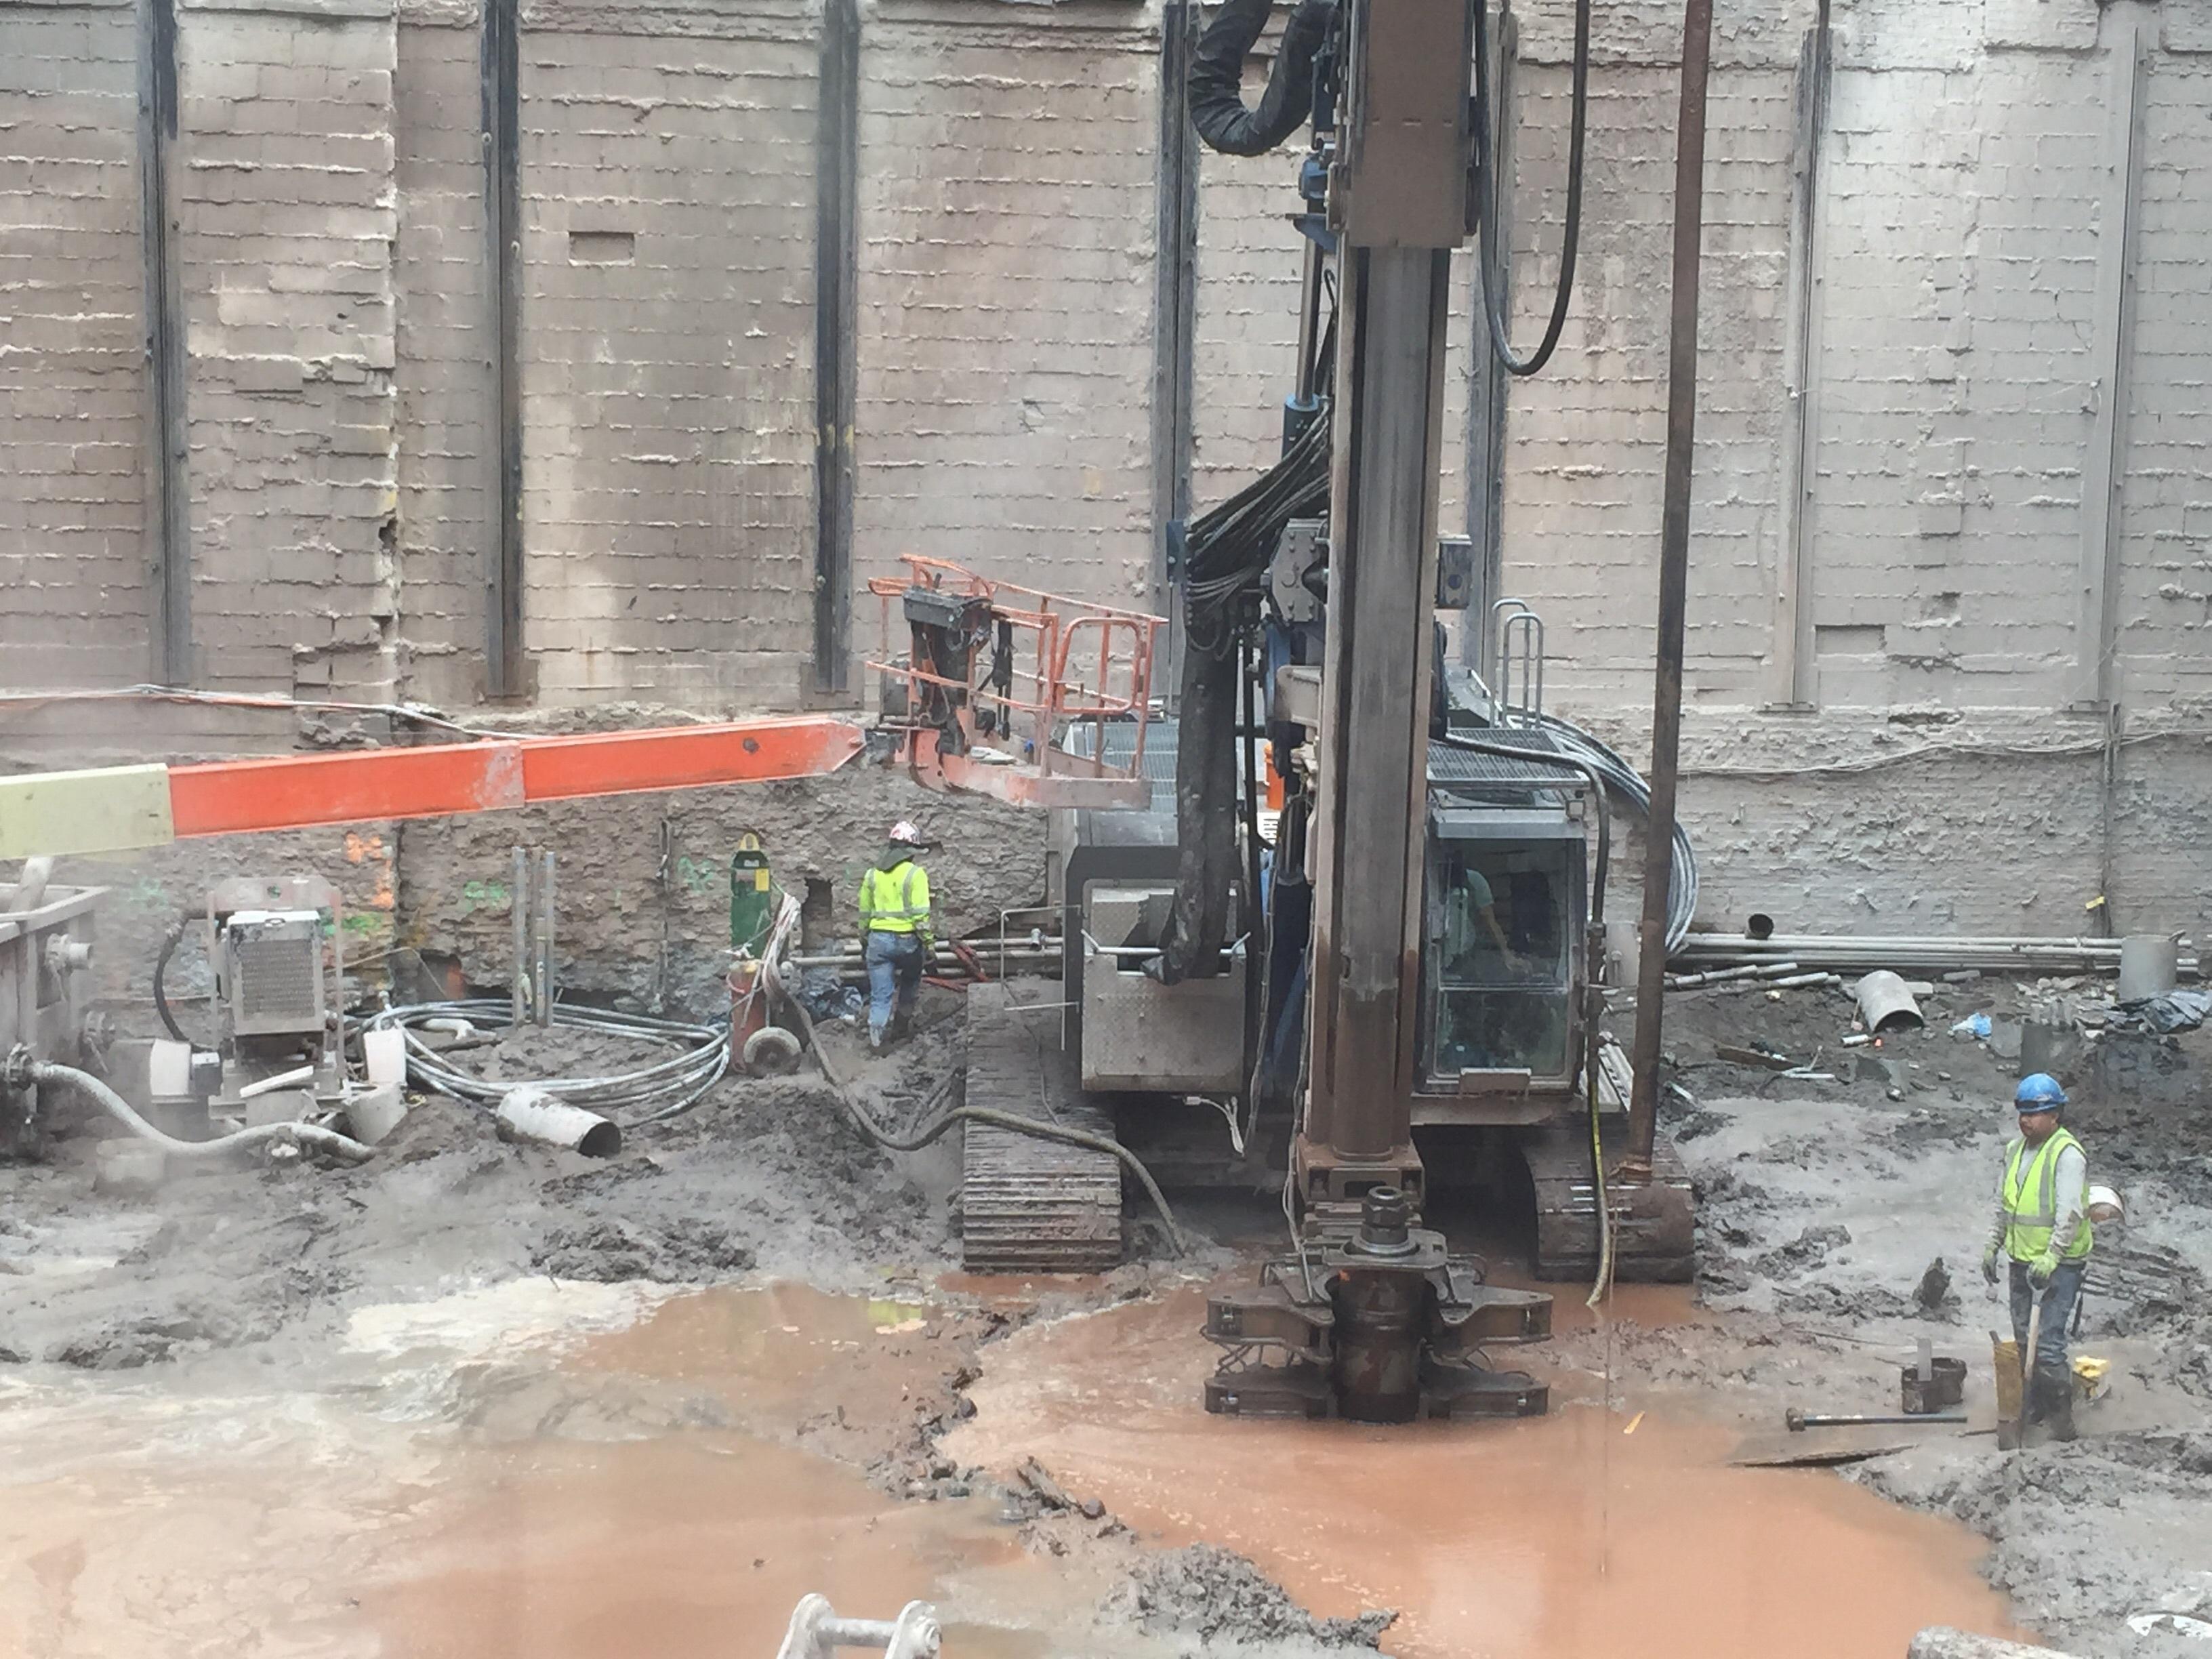 Work at 118 Fulton Street on July 1, 2016. Photo by Robert Walpole